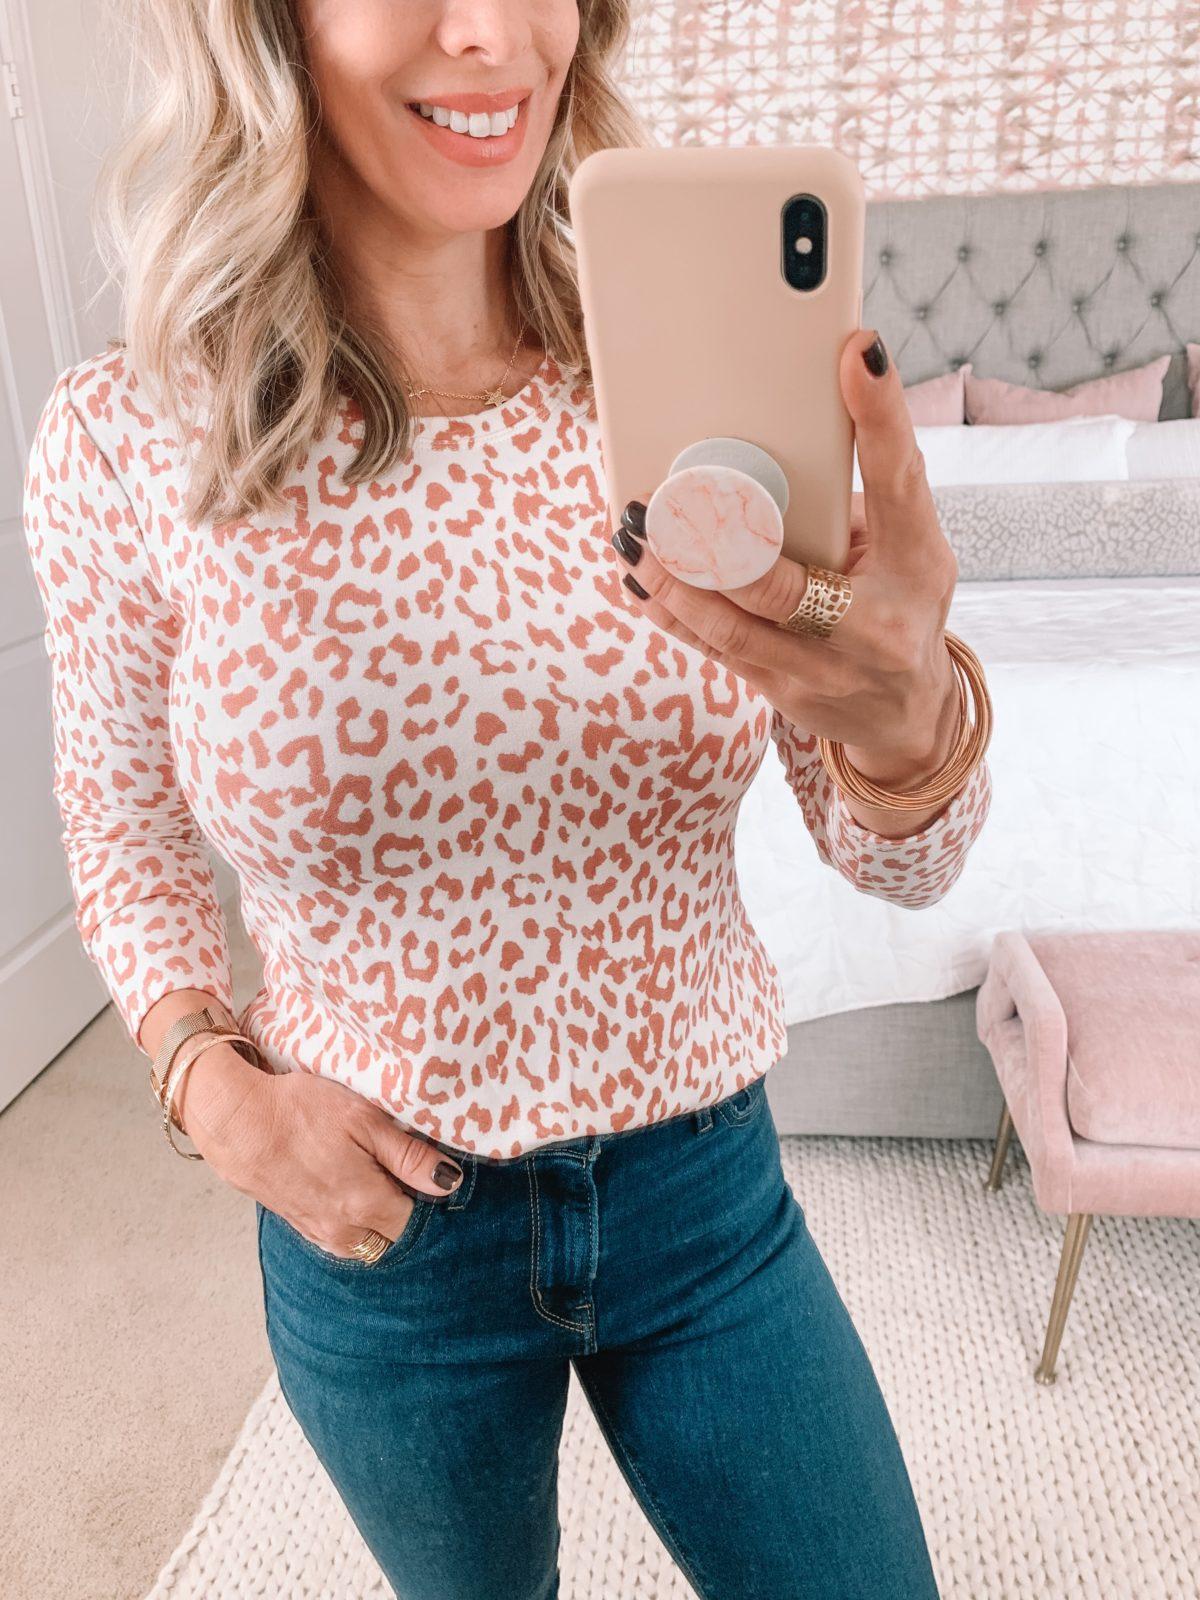 Amazon Fashion Faves, Cheetah Print Top, Jeans